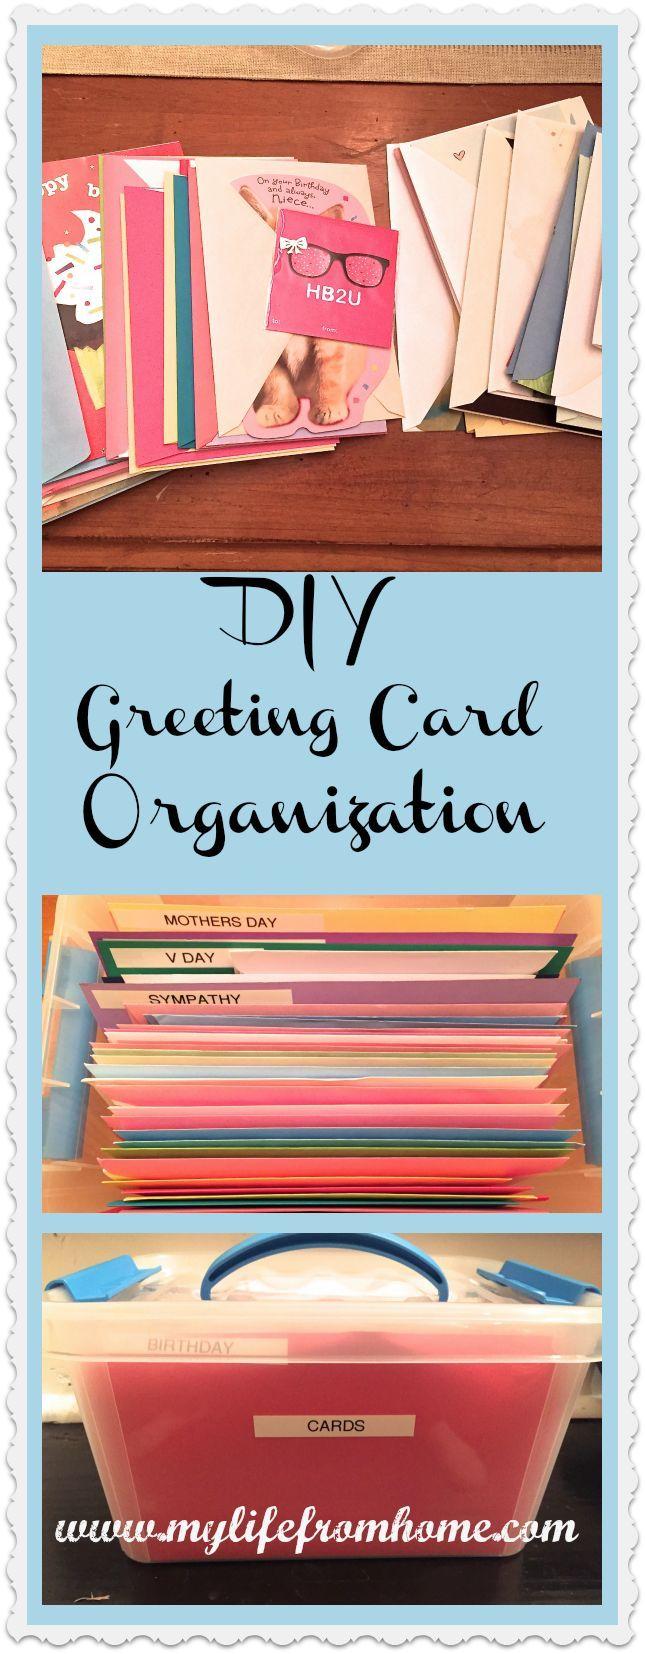 Greeting Card Organization White Cottage Home Living Greeting Card Organizer Greeting Card Storage Card Organizer